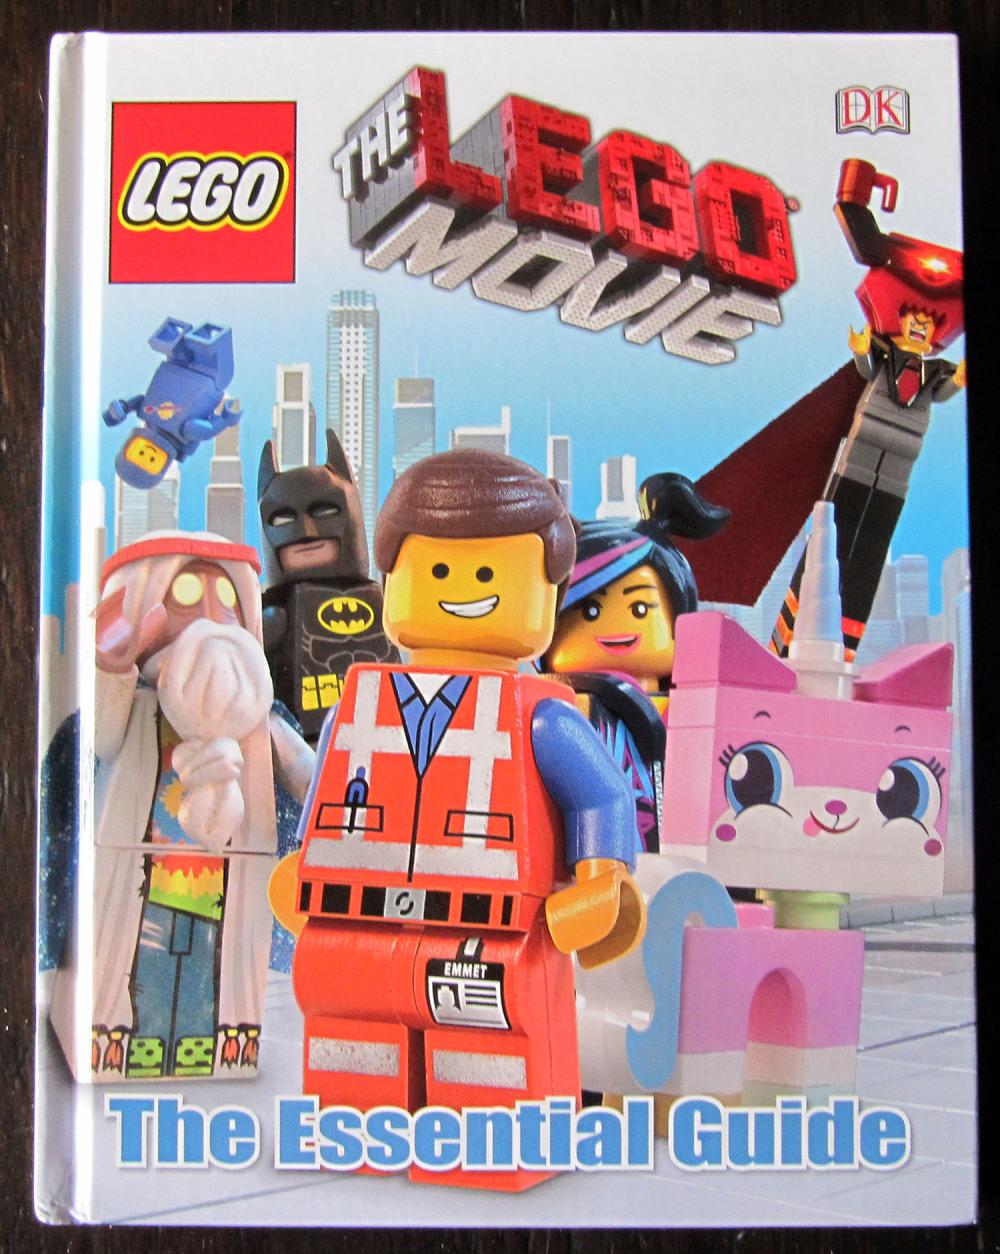 Fraai boek - The Lego Movie: The Essential Guide